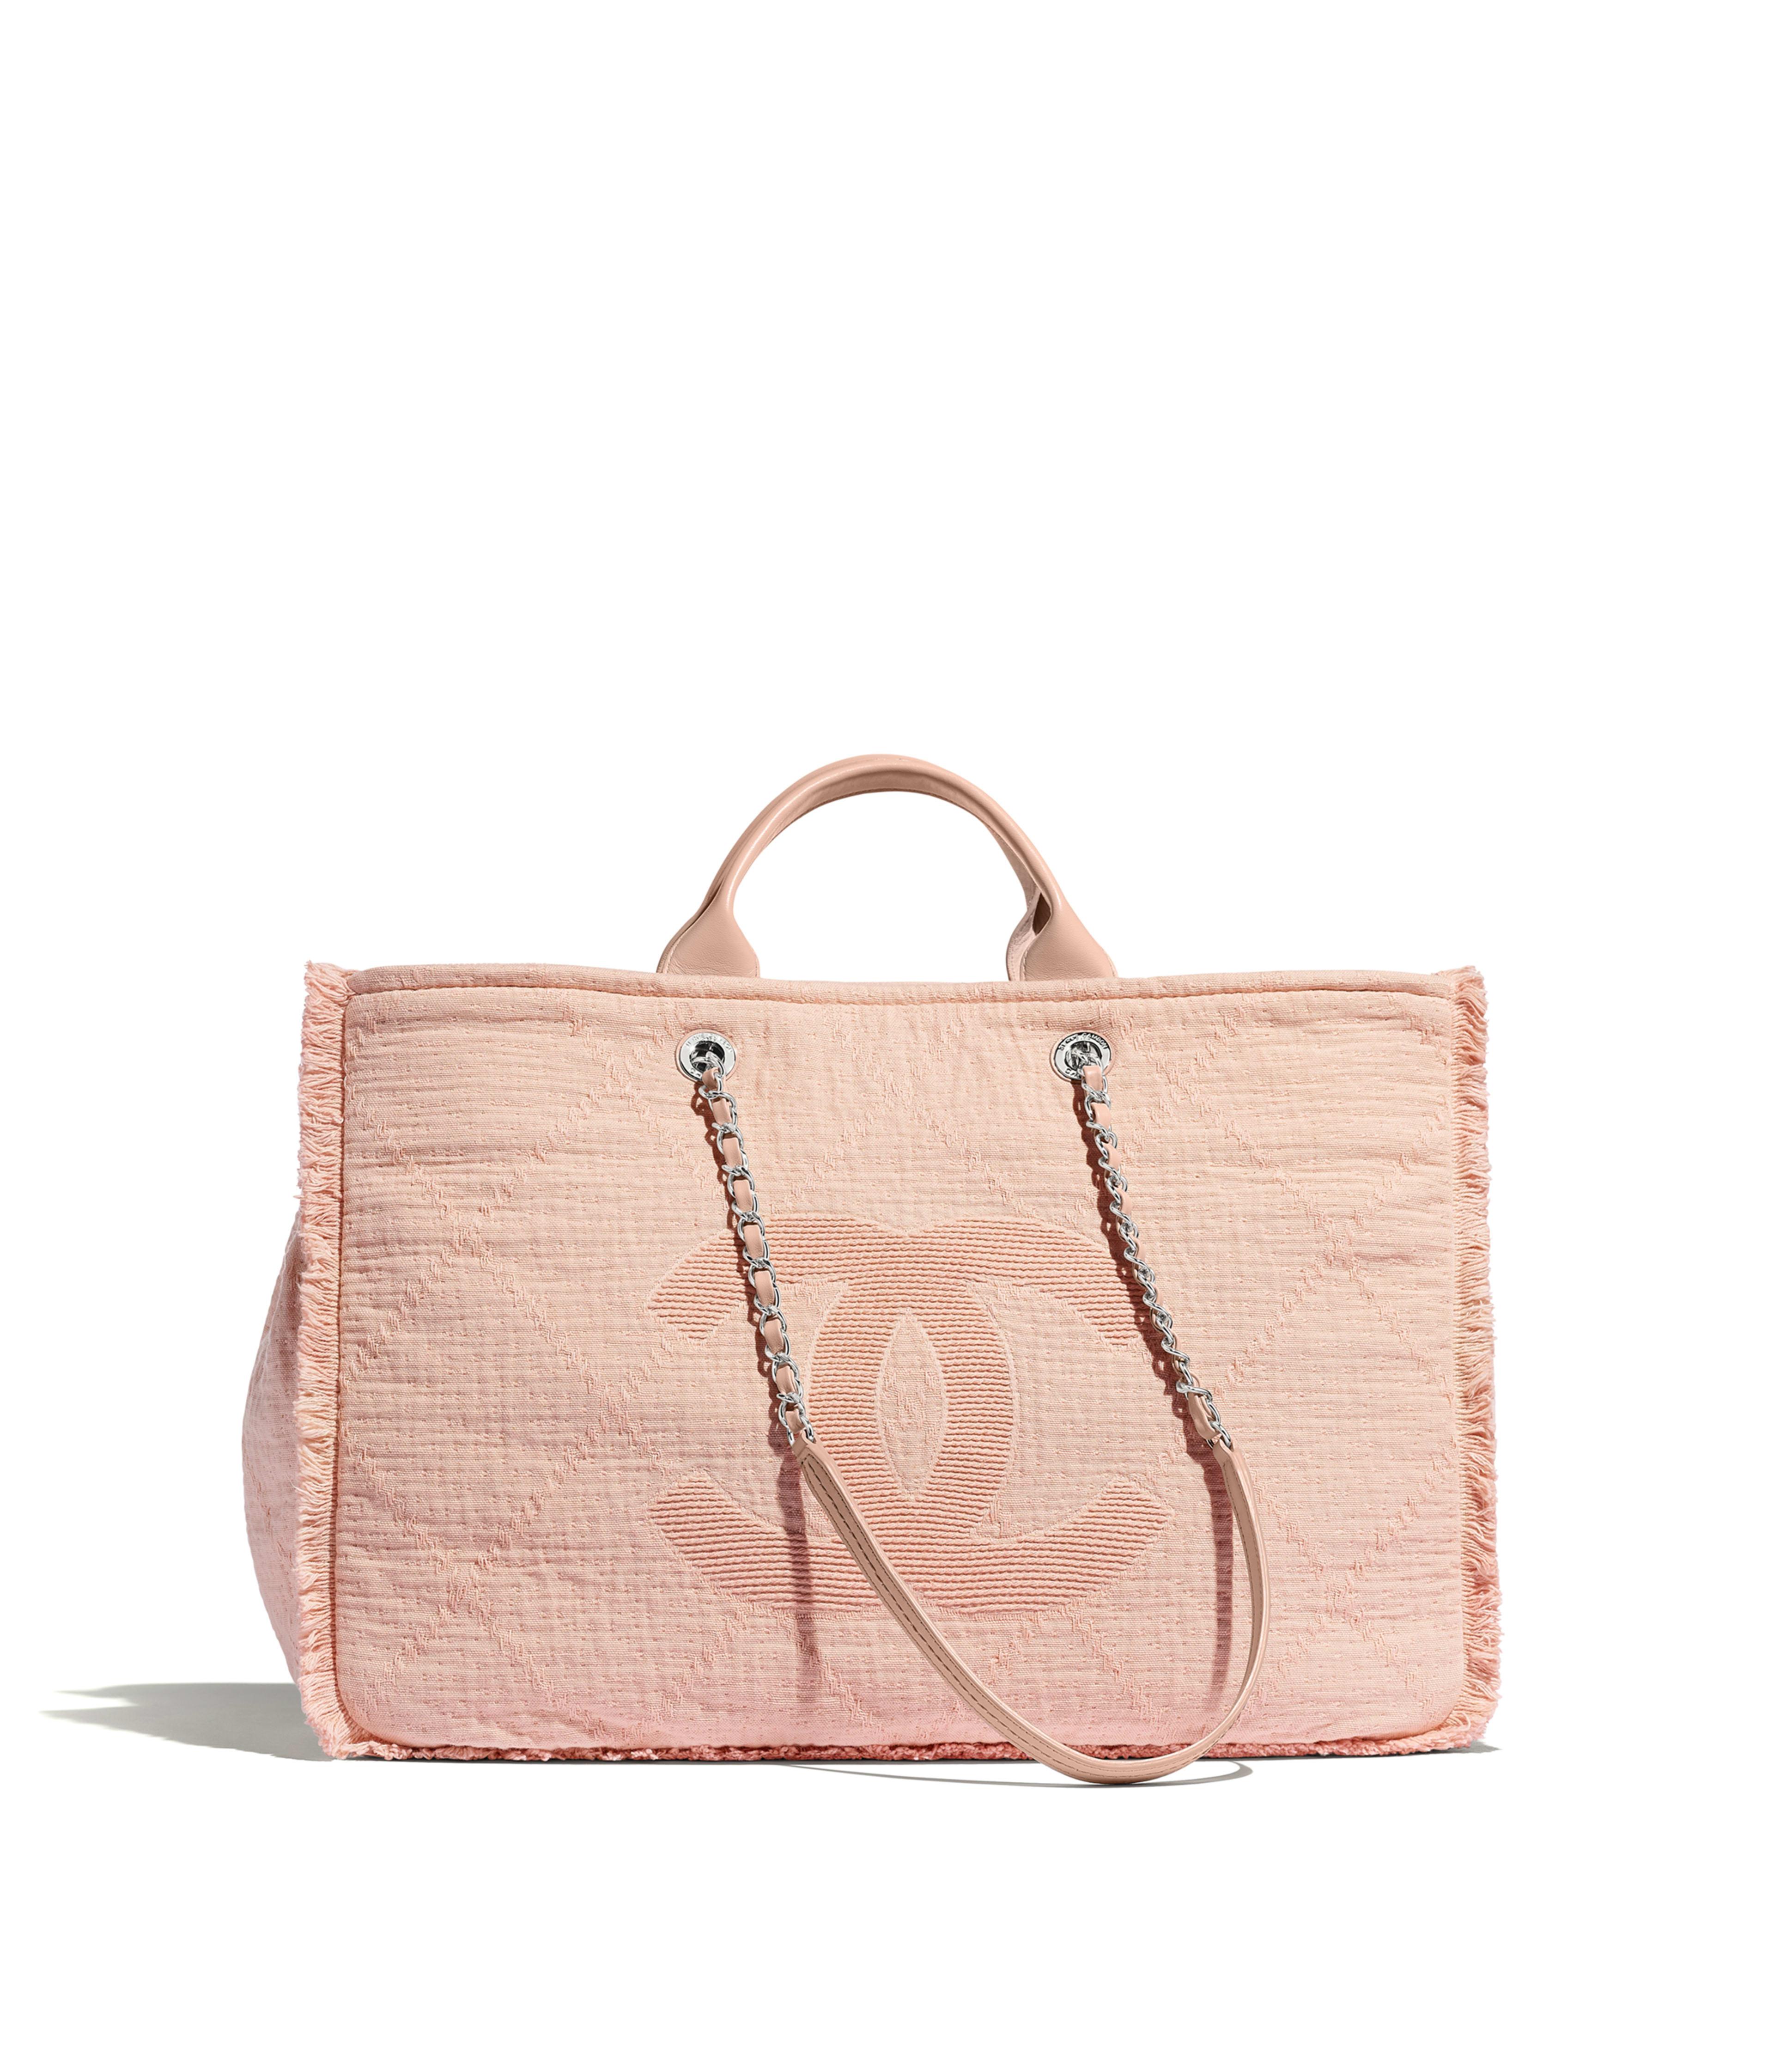 ccaf42a94157 Large Shopping Bag Mixed Fibers